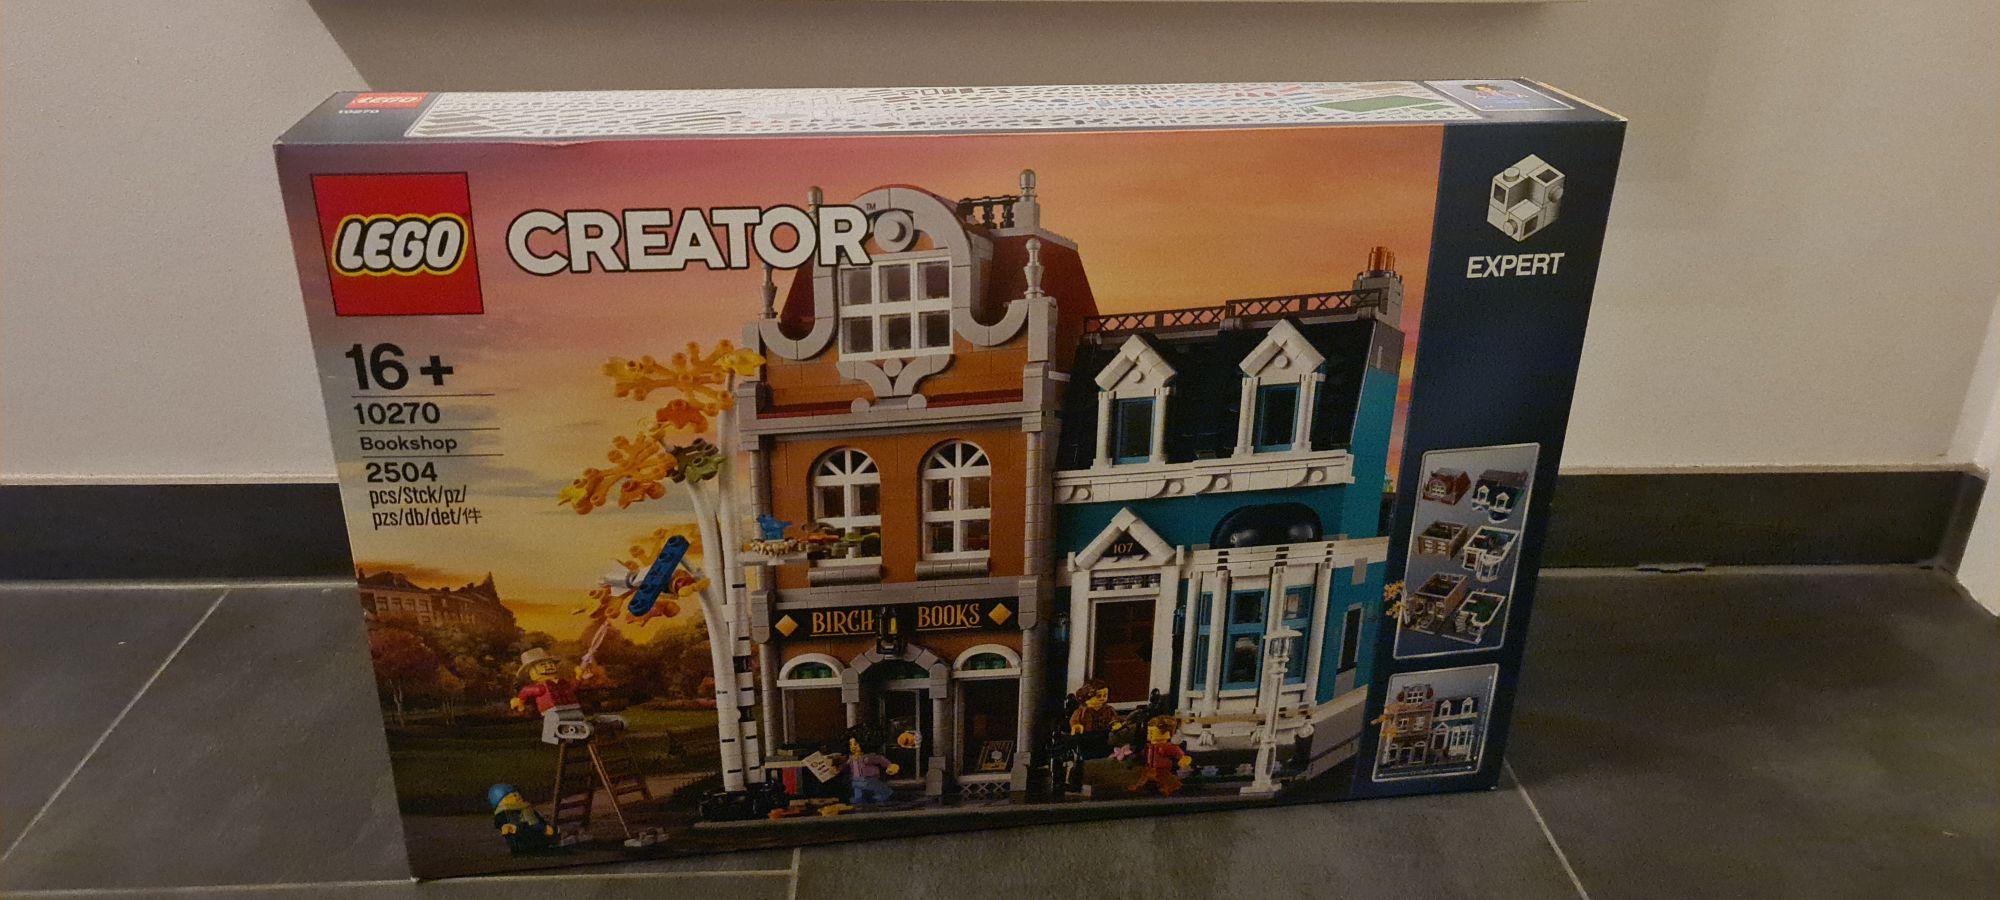 (Bundesweit Galeria Kaufhof) Lego Creator Expert 10270 Buchhandlung